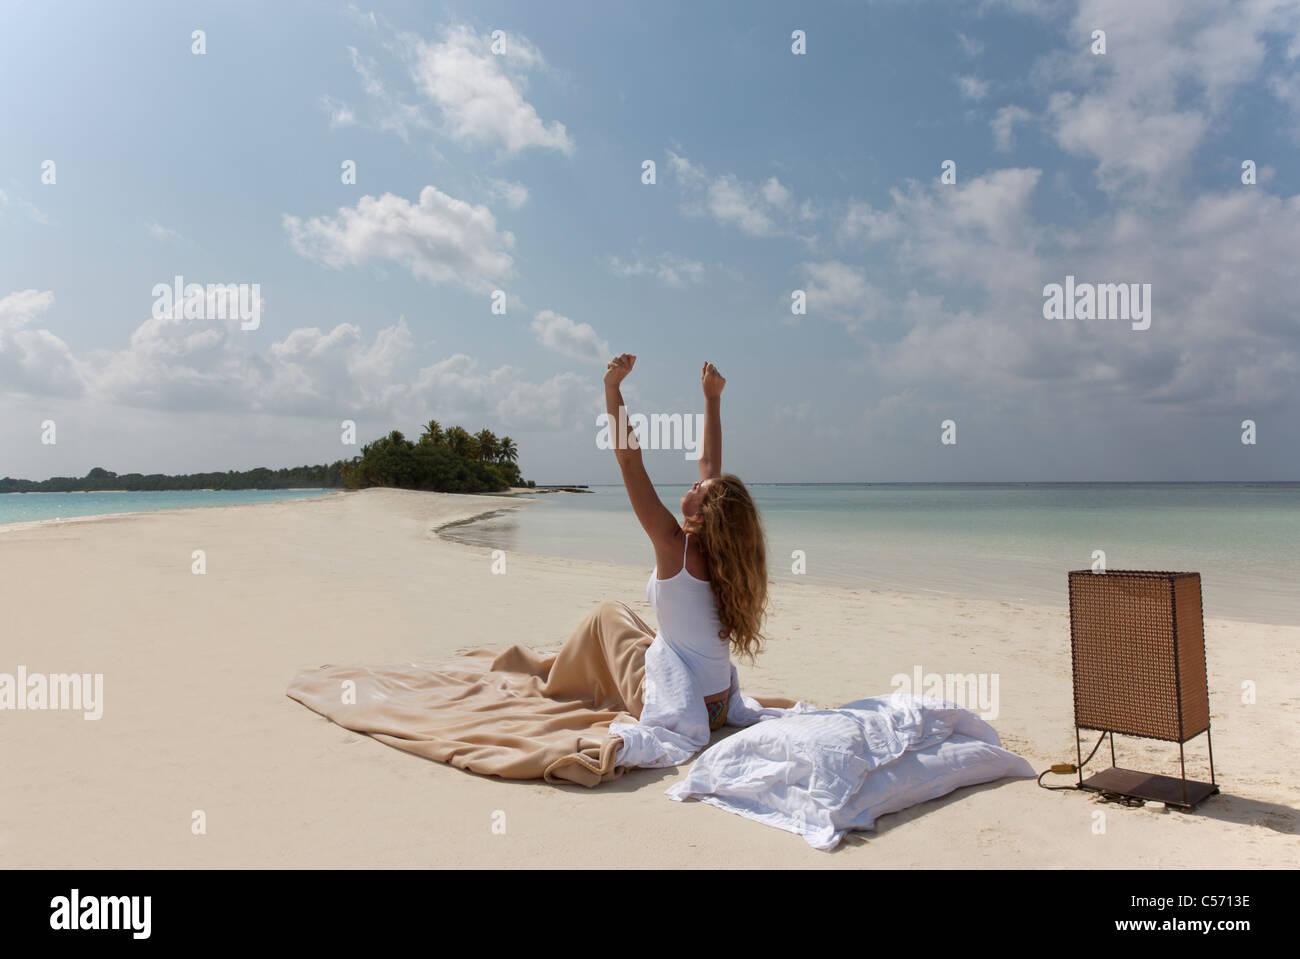 Frau Im Bett Am Strand Aufwachen Stockfoto Bild 37648562 Alamy